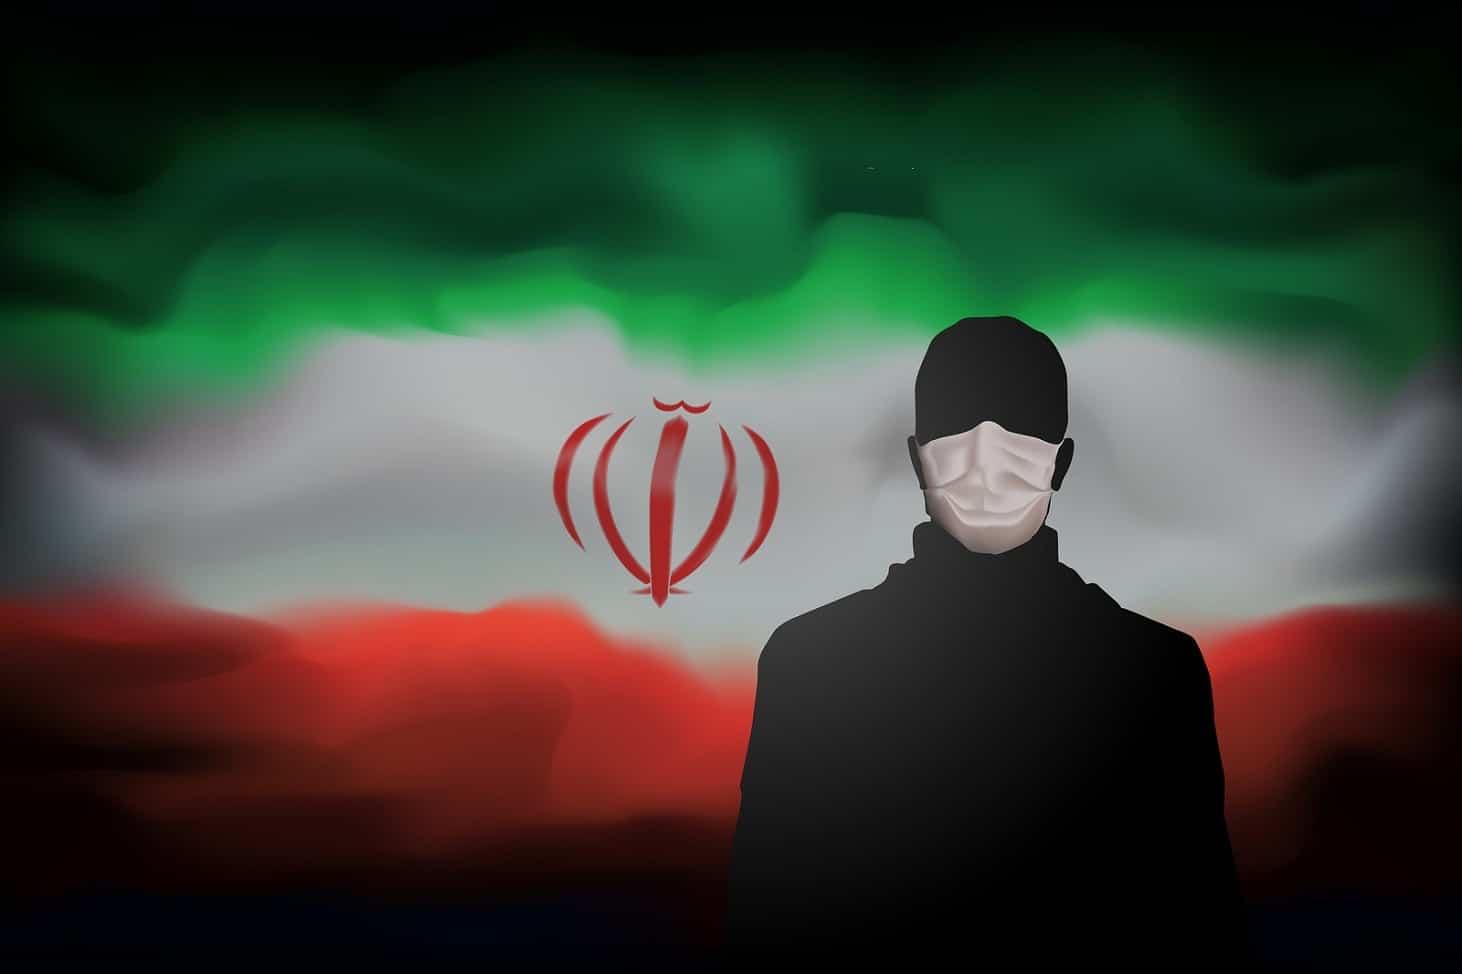 Covid-19 Coronavirus Epidemic In Iran. Silhouette Of Man In Medi